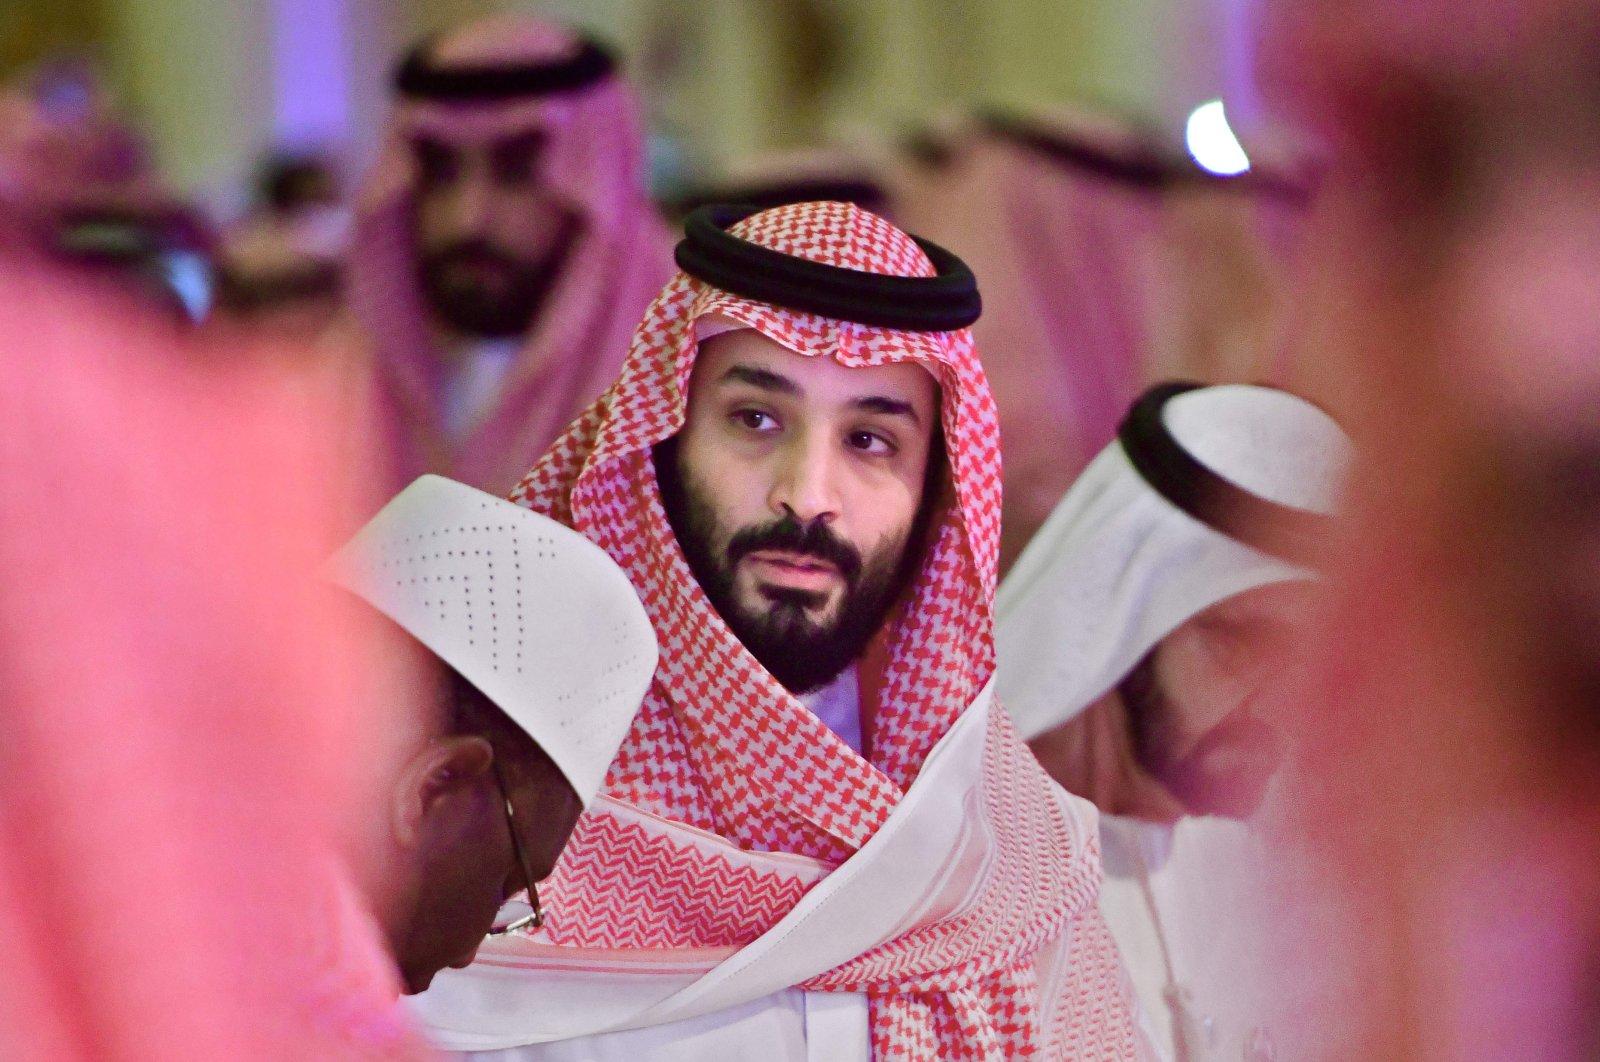 Saudi Crown Prince Mohammed bin Salman arrives at the Future Investment Initiative (FII) conference in the capital Riyadh, Saudi Arabia, Oct. 24, 2018. (AFP Photo)